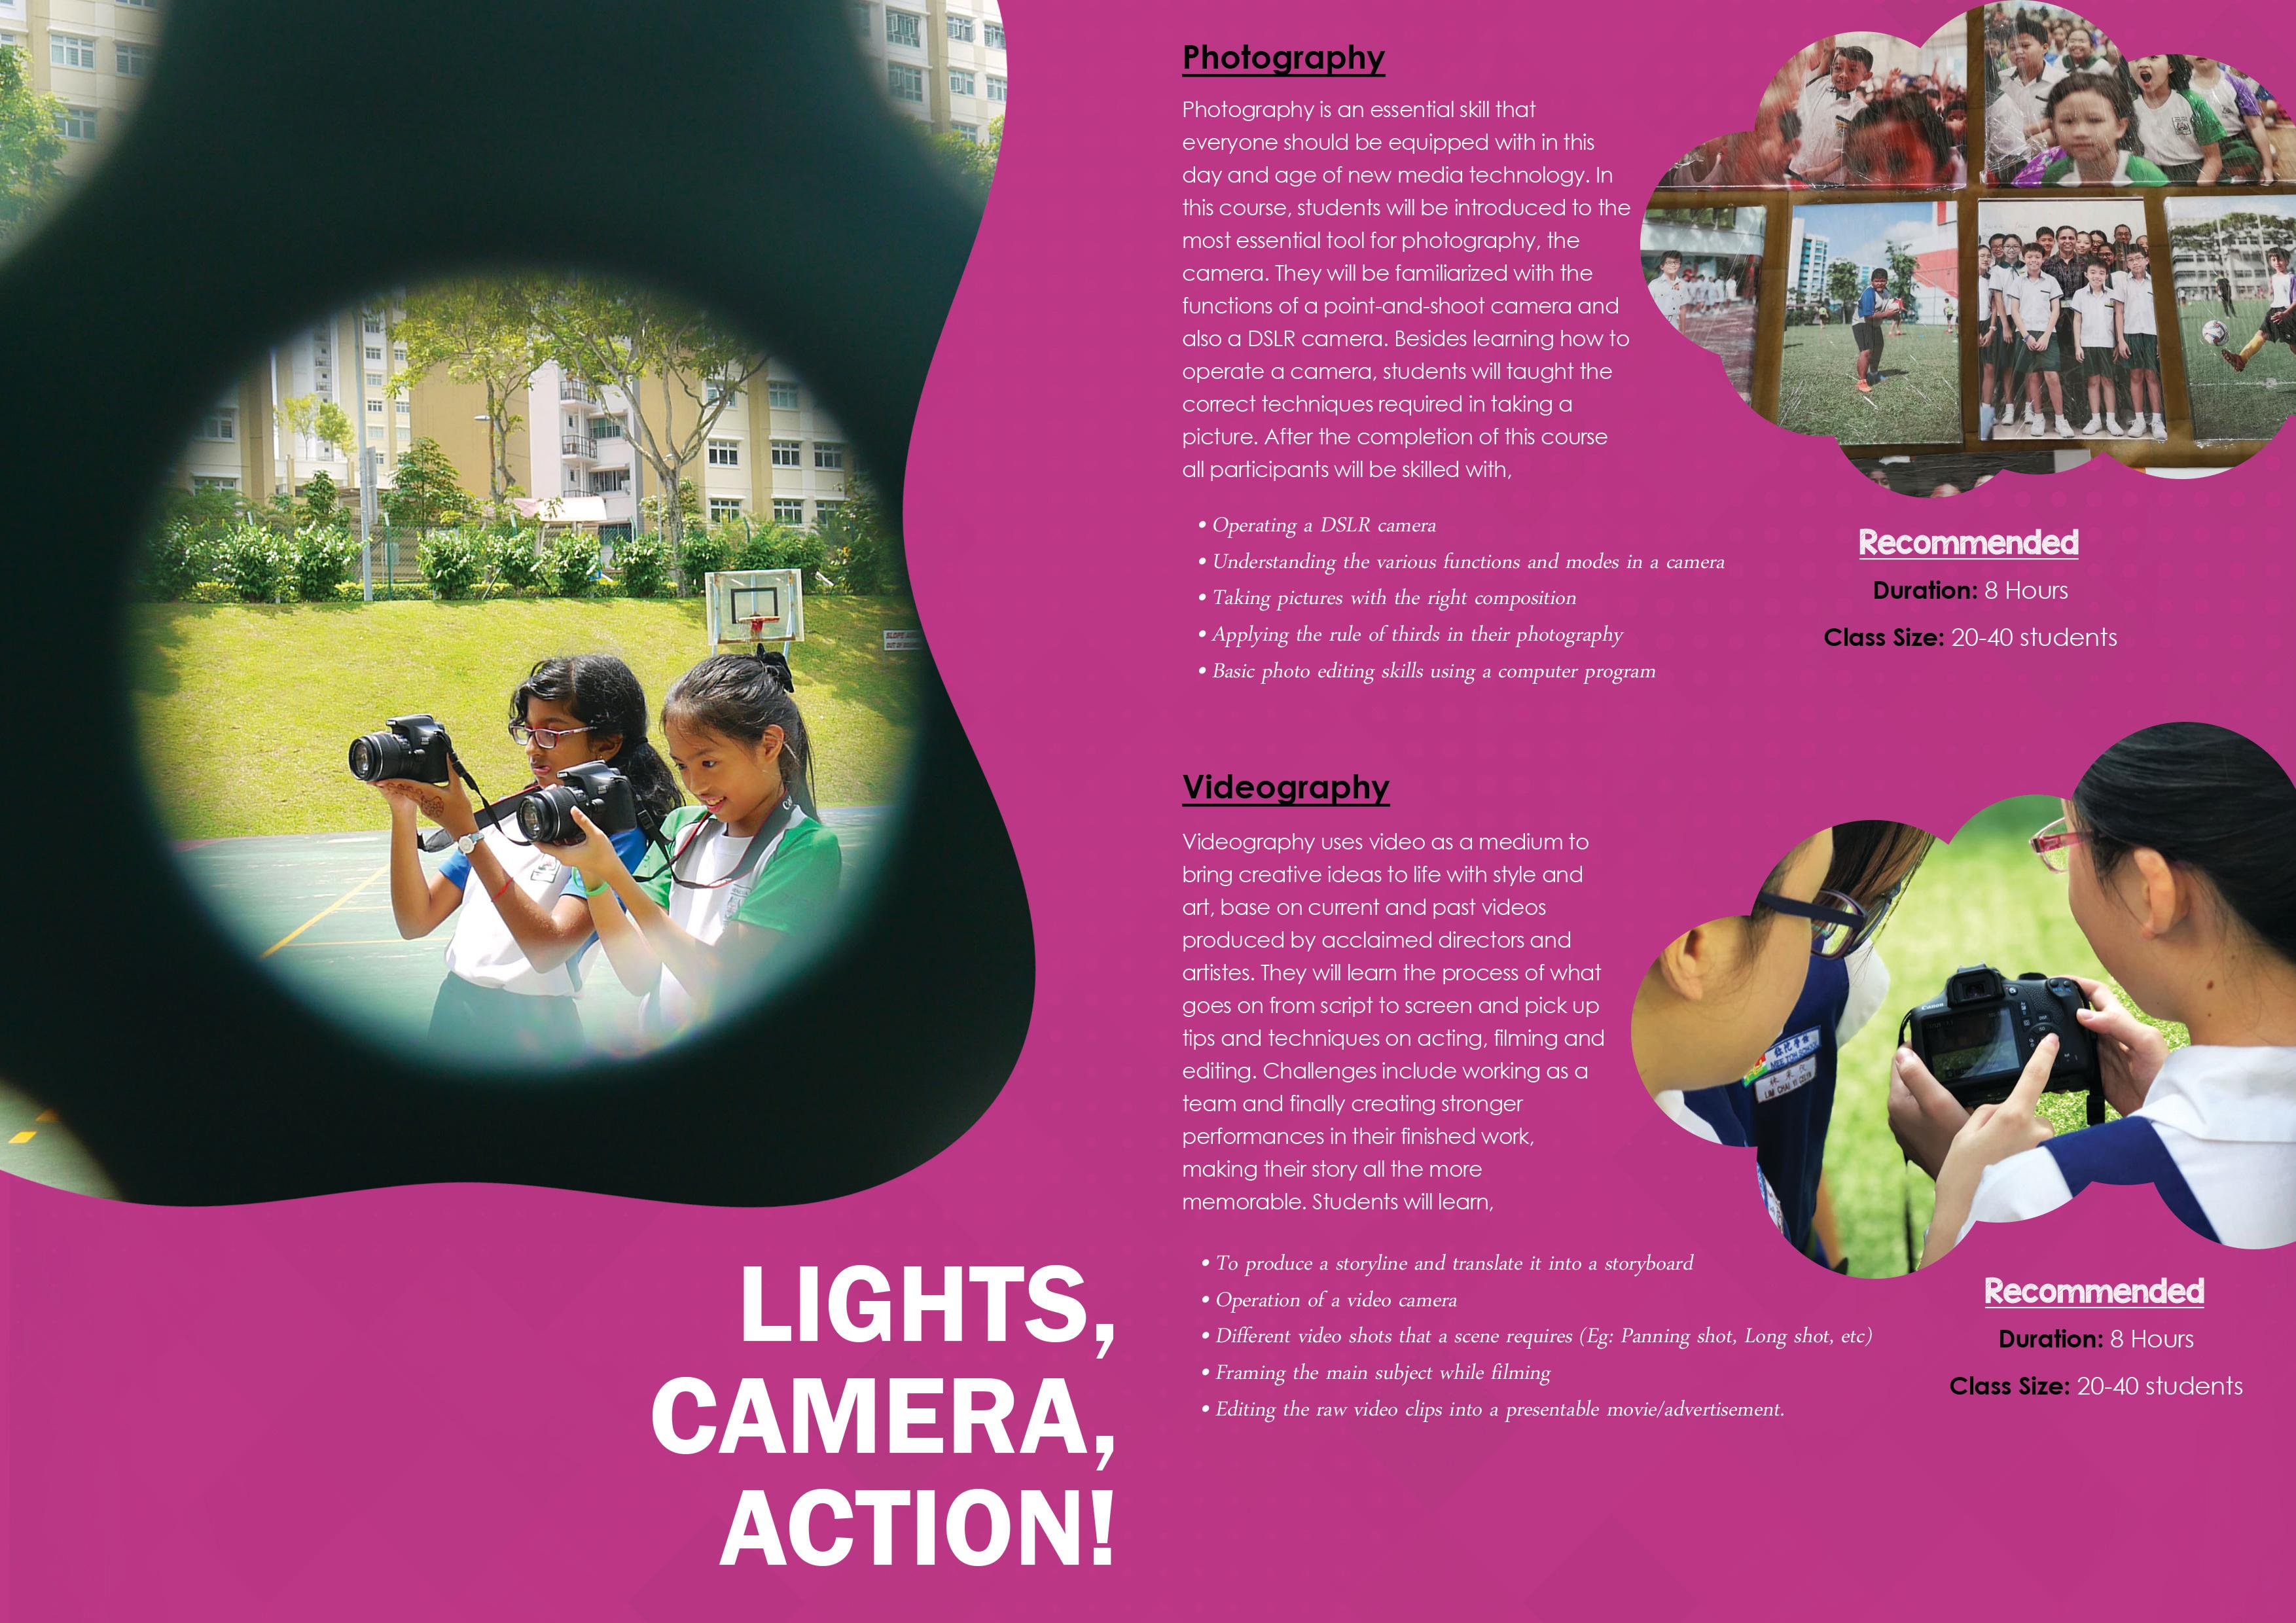 7 Lights Camera Action